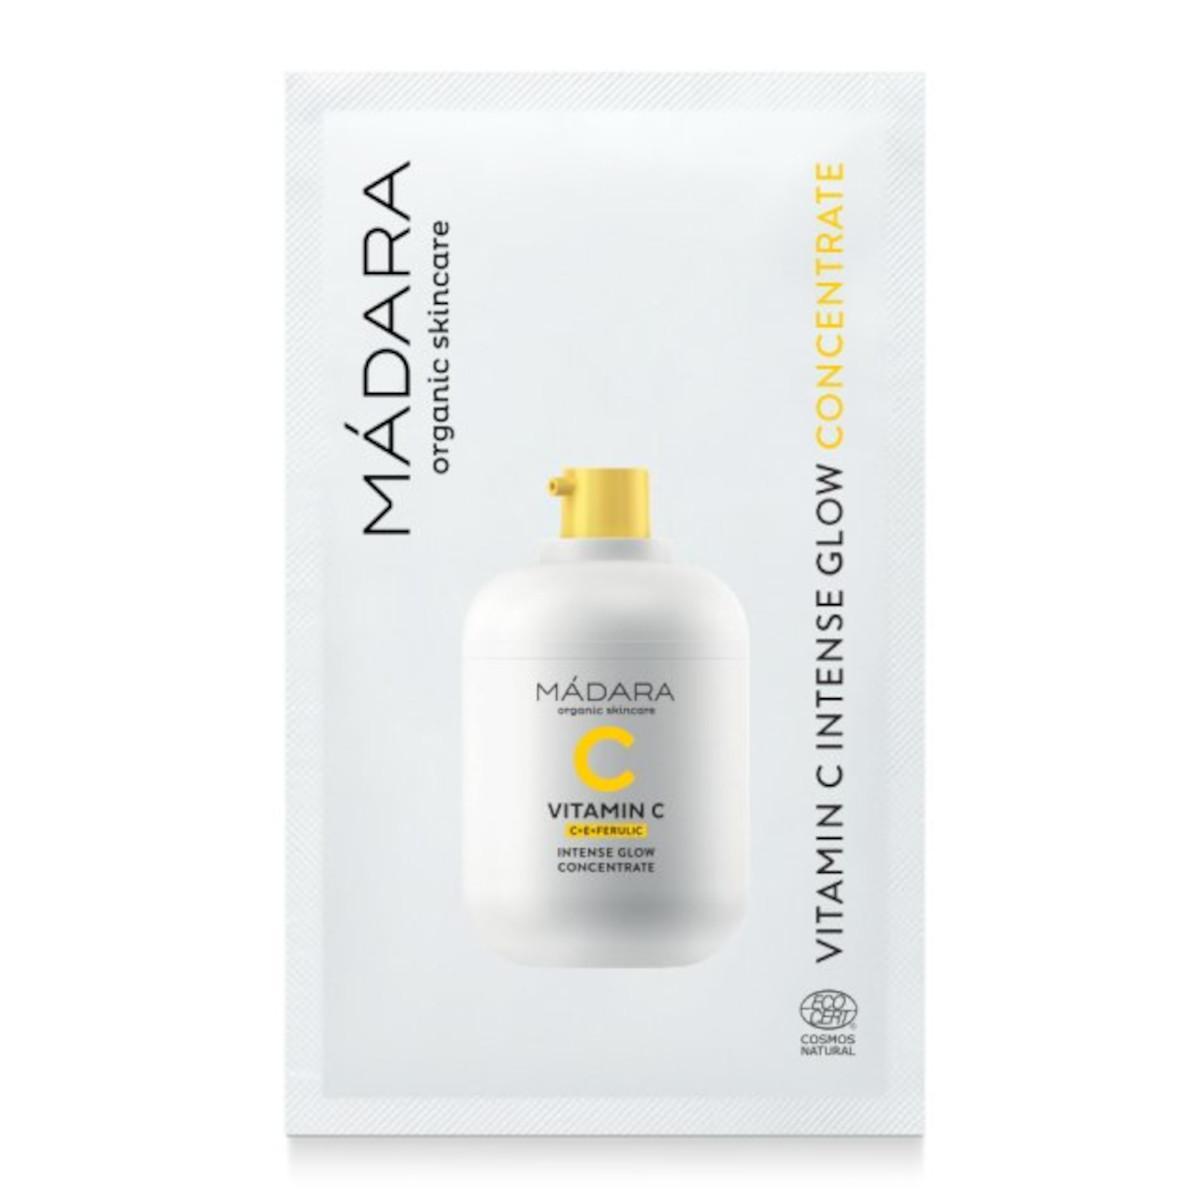 MÁDARA Vitamin C Intense Glow Concentrate 2 ml